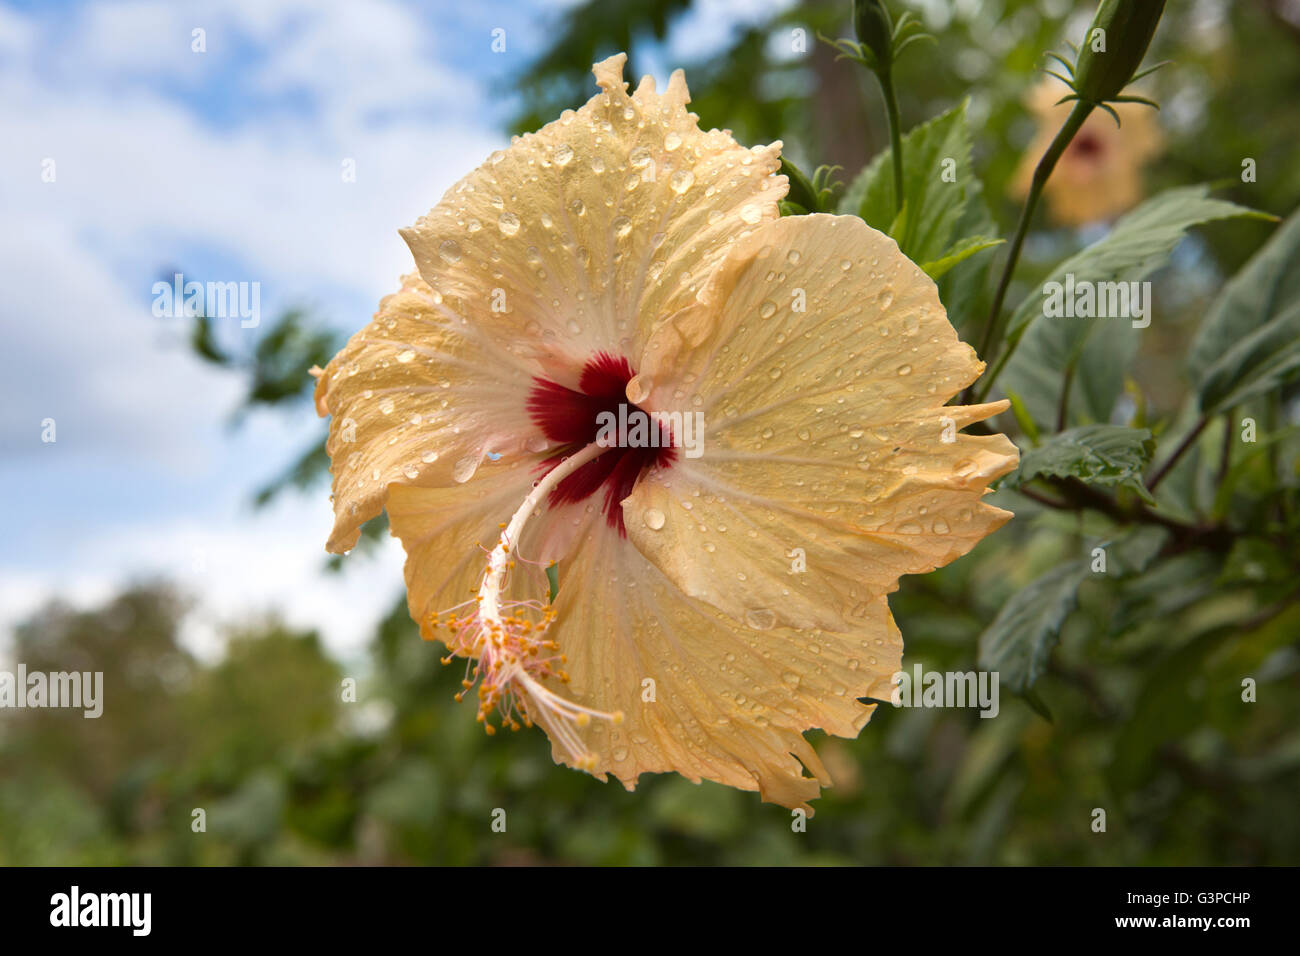 Asian hibiscus flowers stock photos asian hibiscus flowers stock sri lanka kataragama drops of rainwater on pale orange hibiscus flower stock image izmirmasajfo Gallery